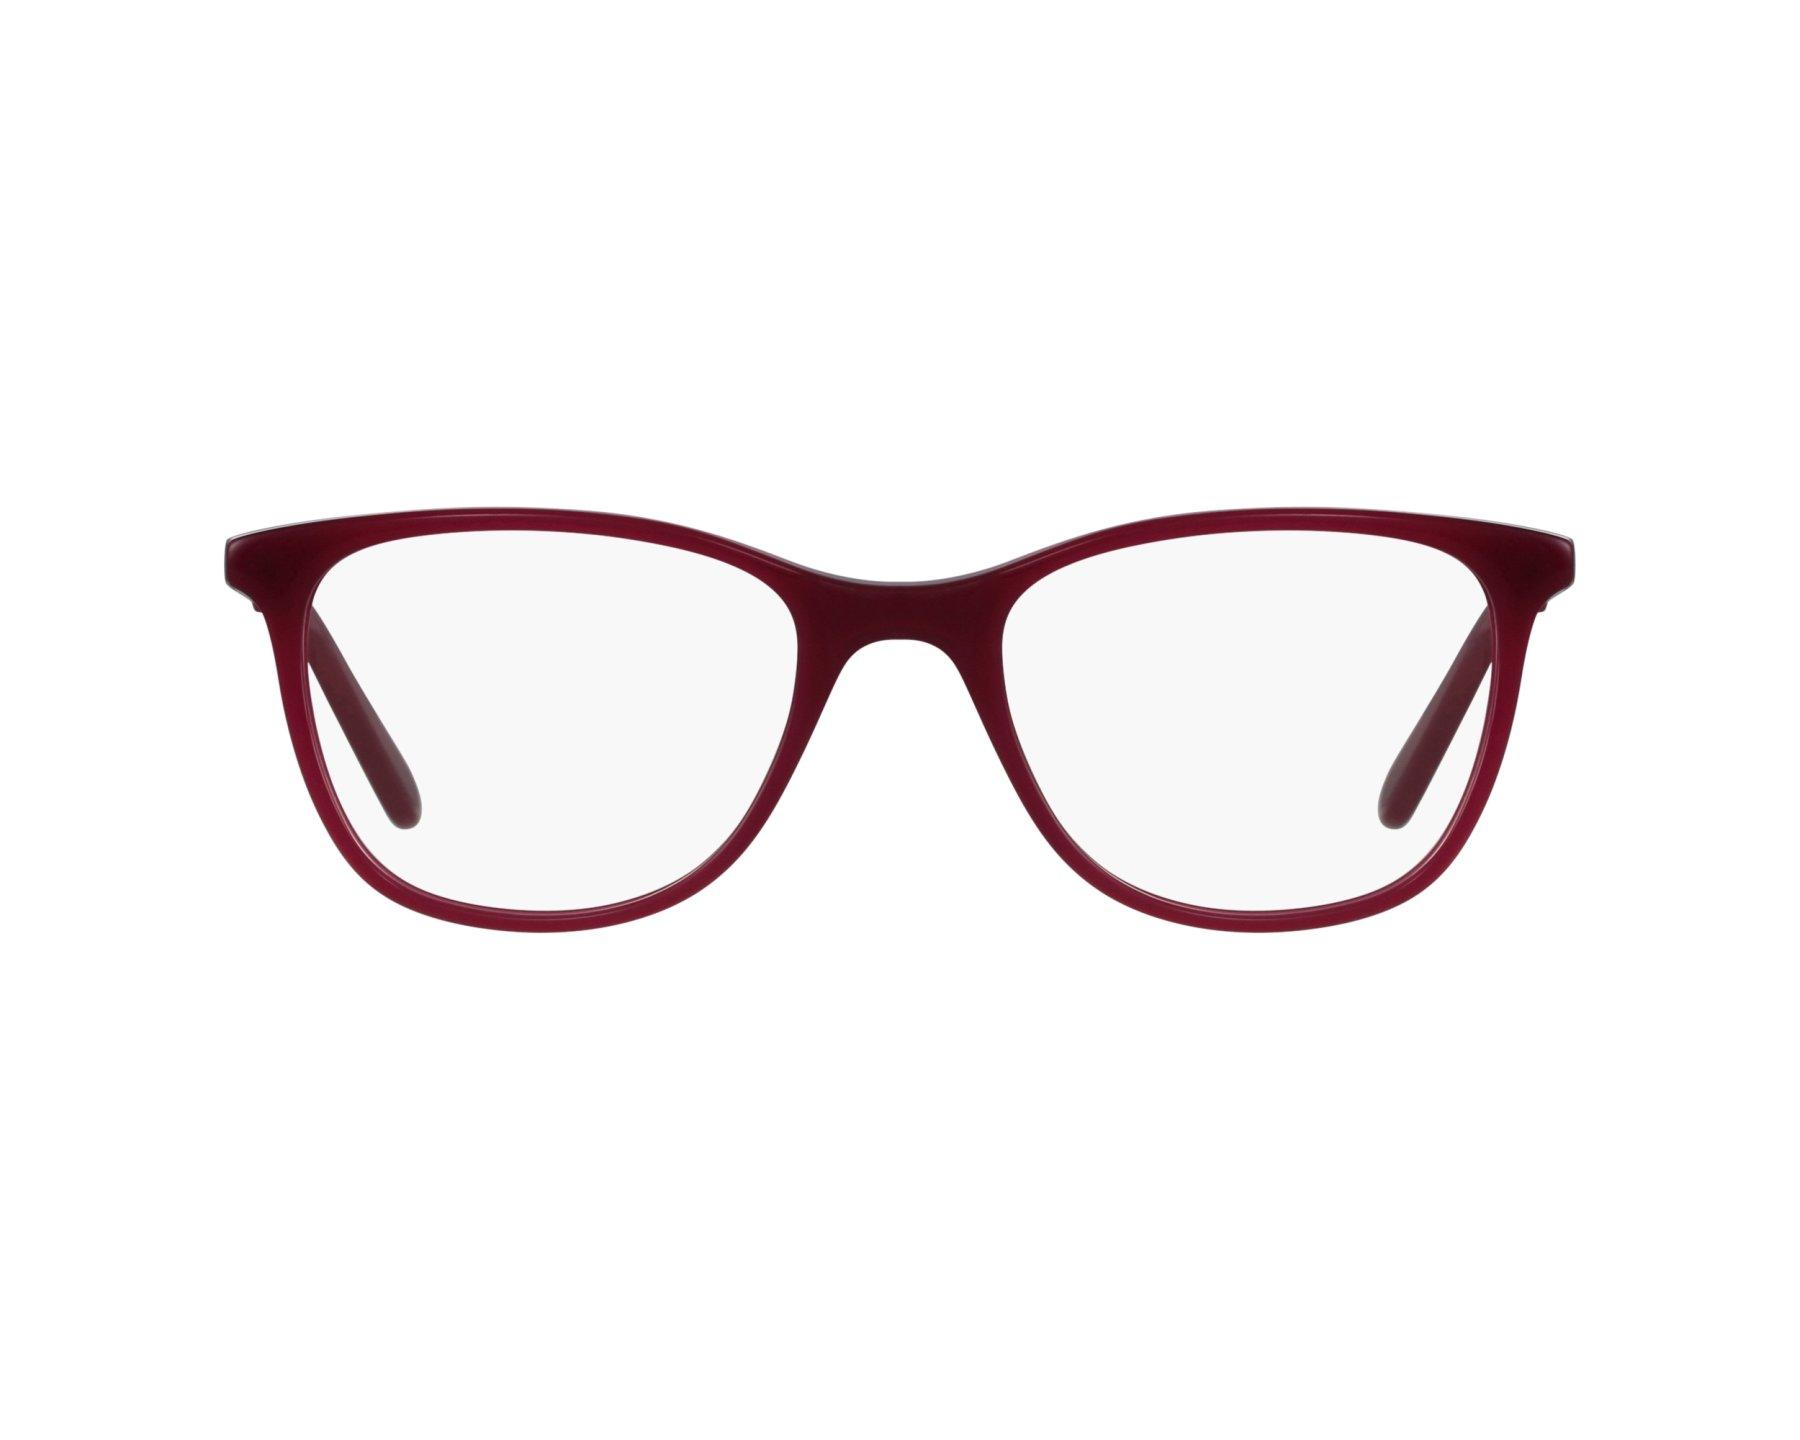 f4d867737f Gafas Graduadas Guess GU-2566 075 49-17 Fuchsia Lila Purpura vista de perfil